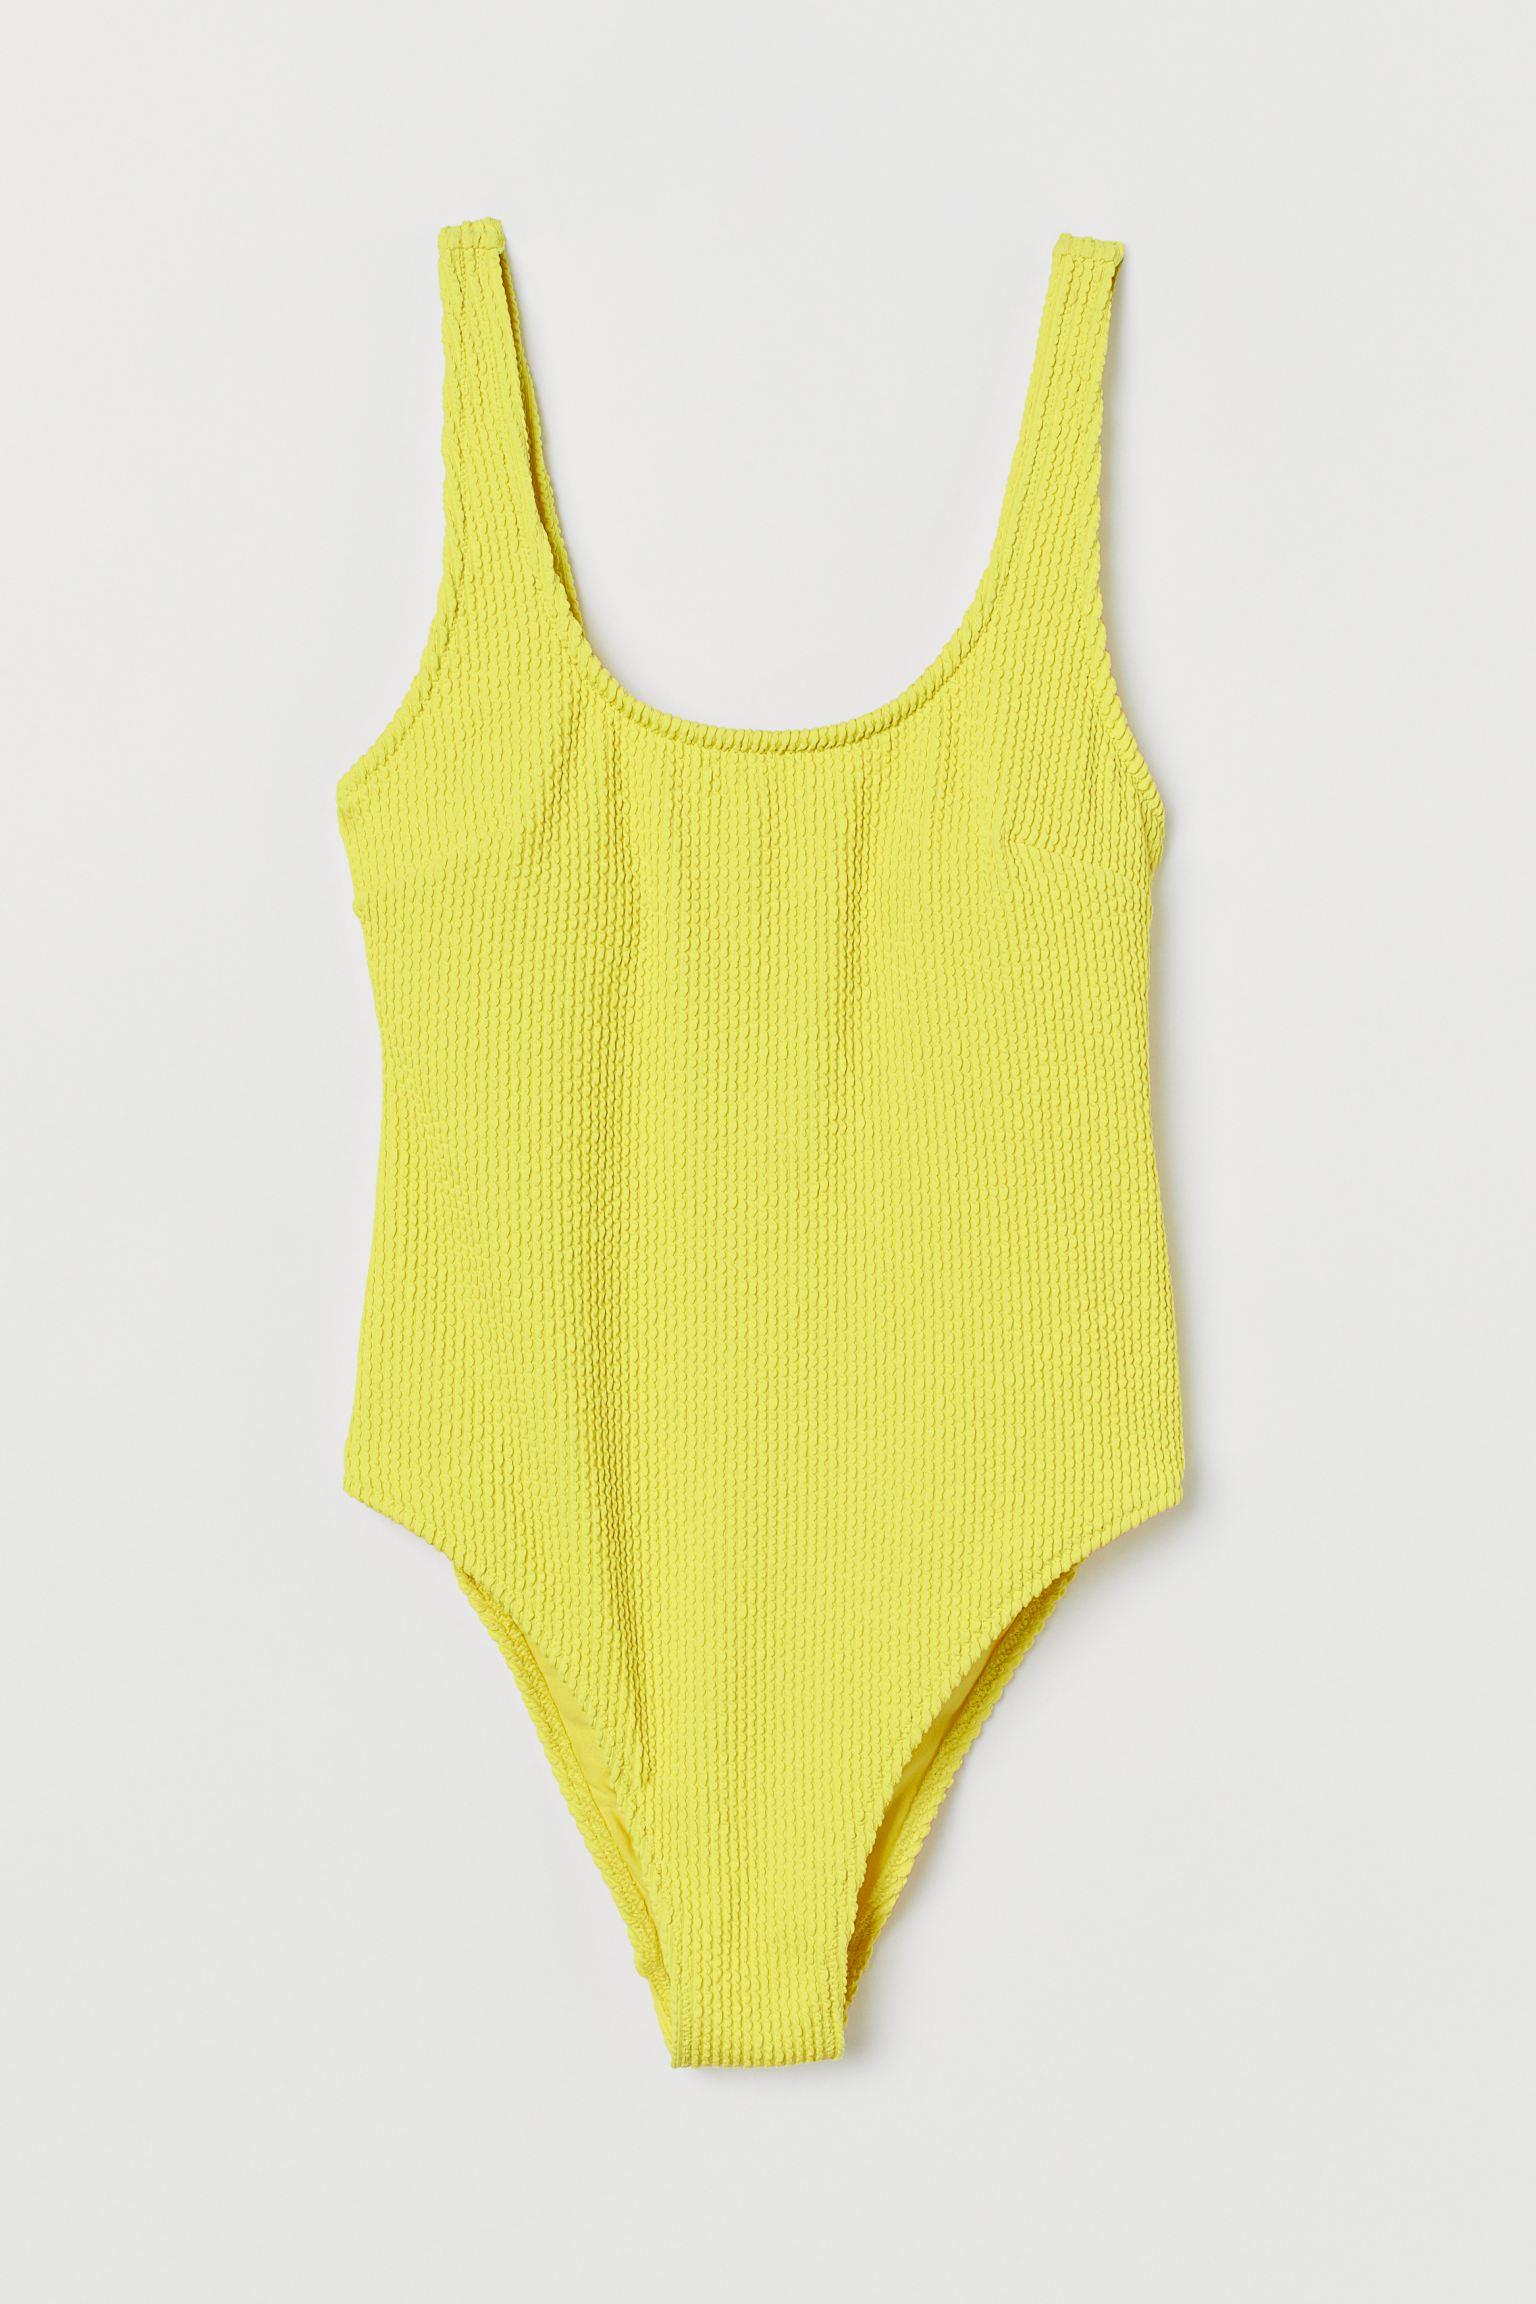 Swimsuit High leg h&m neon yellow